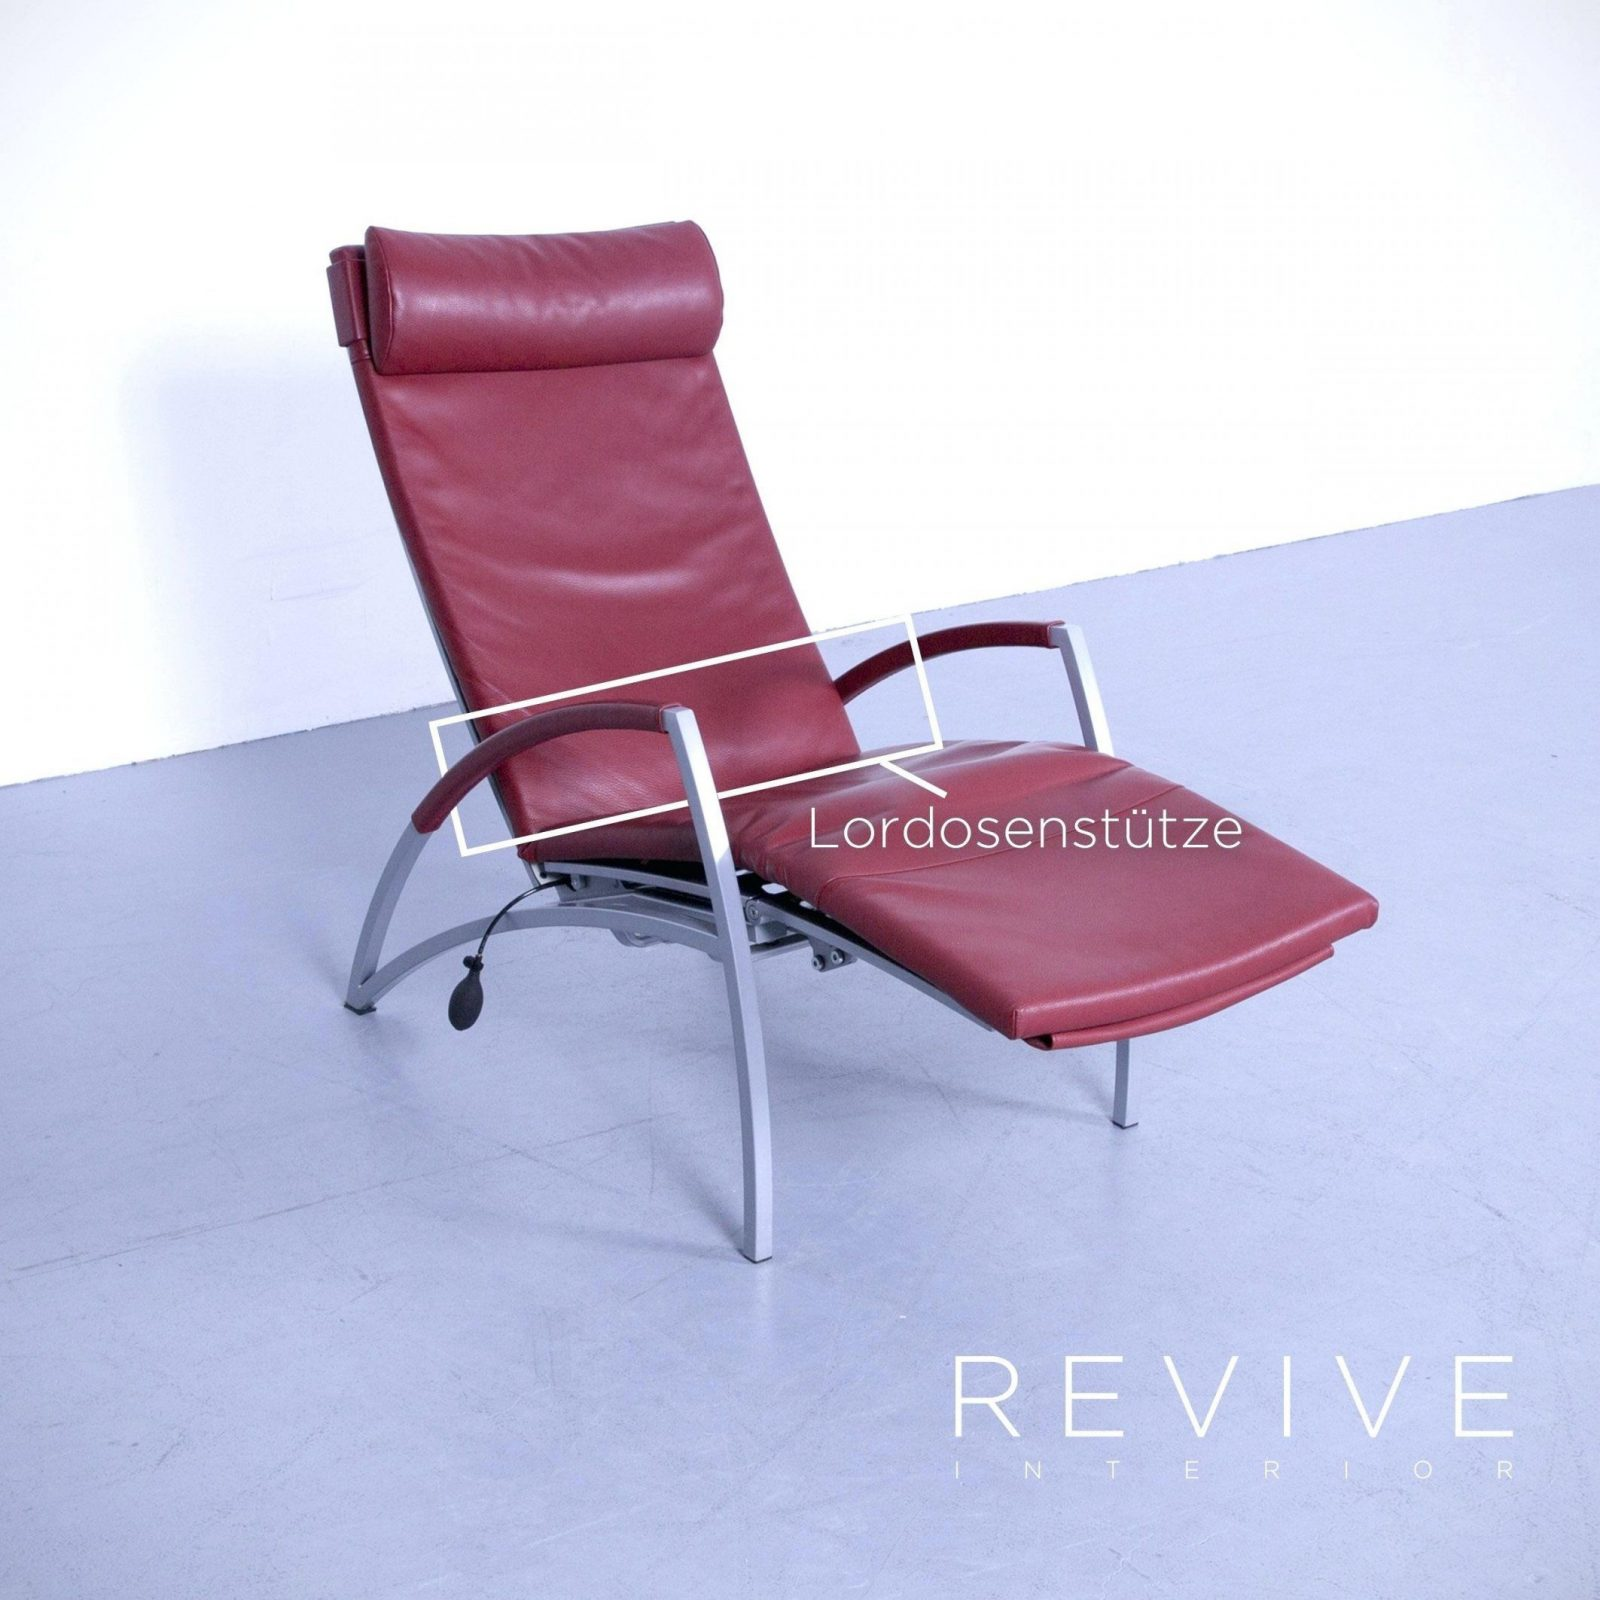 Luxury Relax Liege 5015 Pu 1 Kettler Liegestuhl Basic Plus Liegen von Kettler Basic Plus Liege Photo